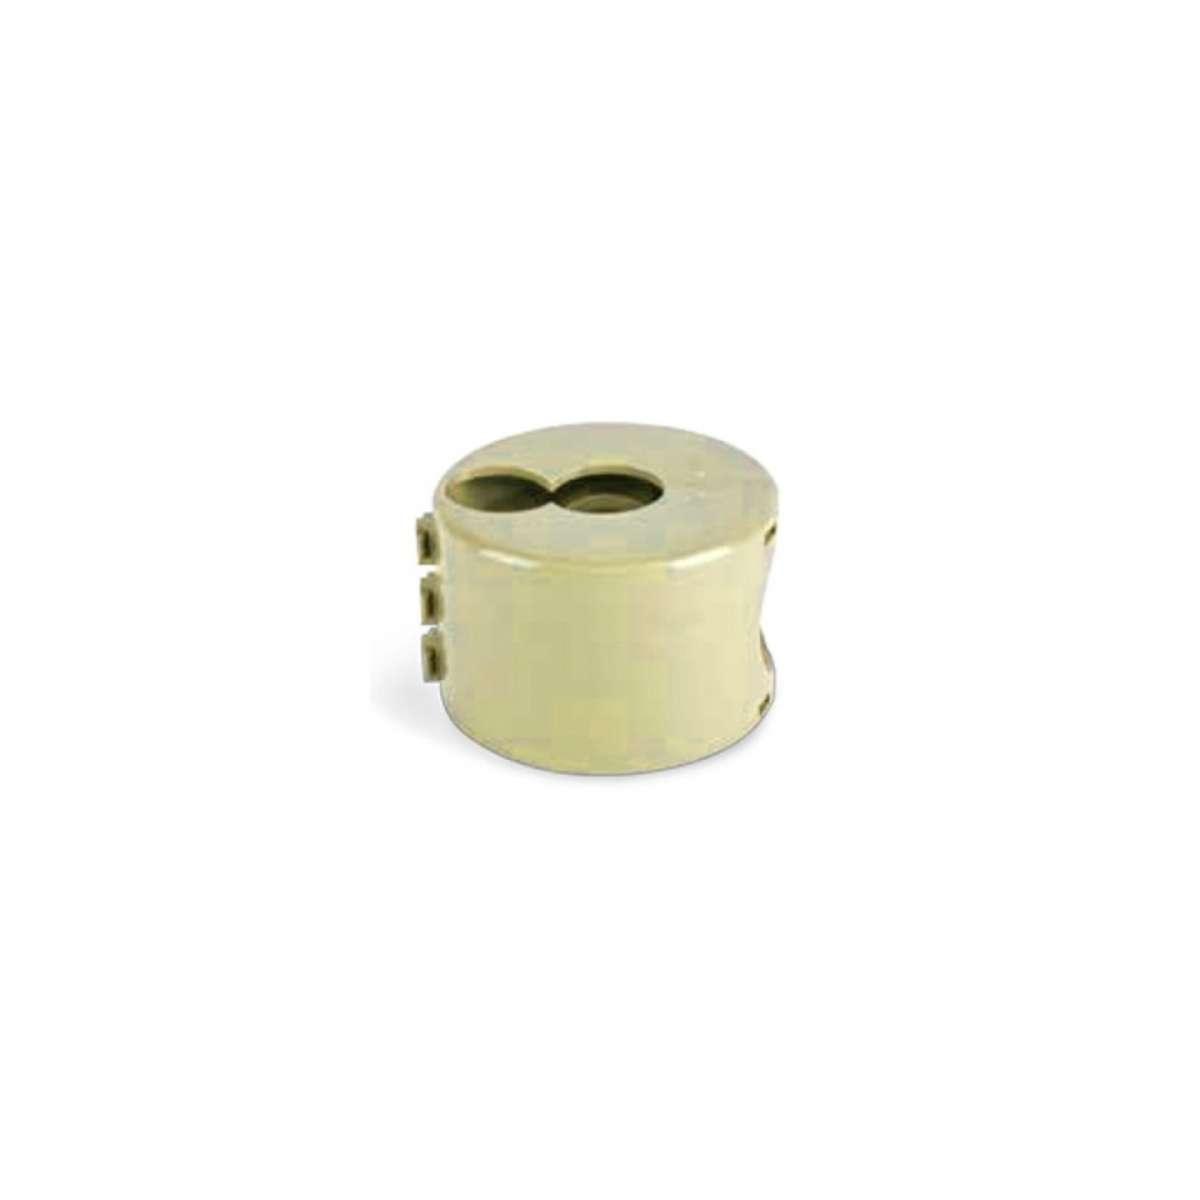 IsoLink Pump Color-Coding Ring - Beige